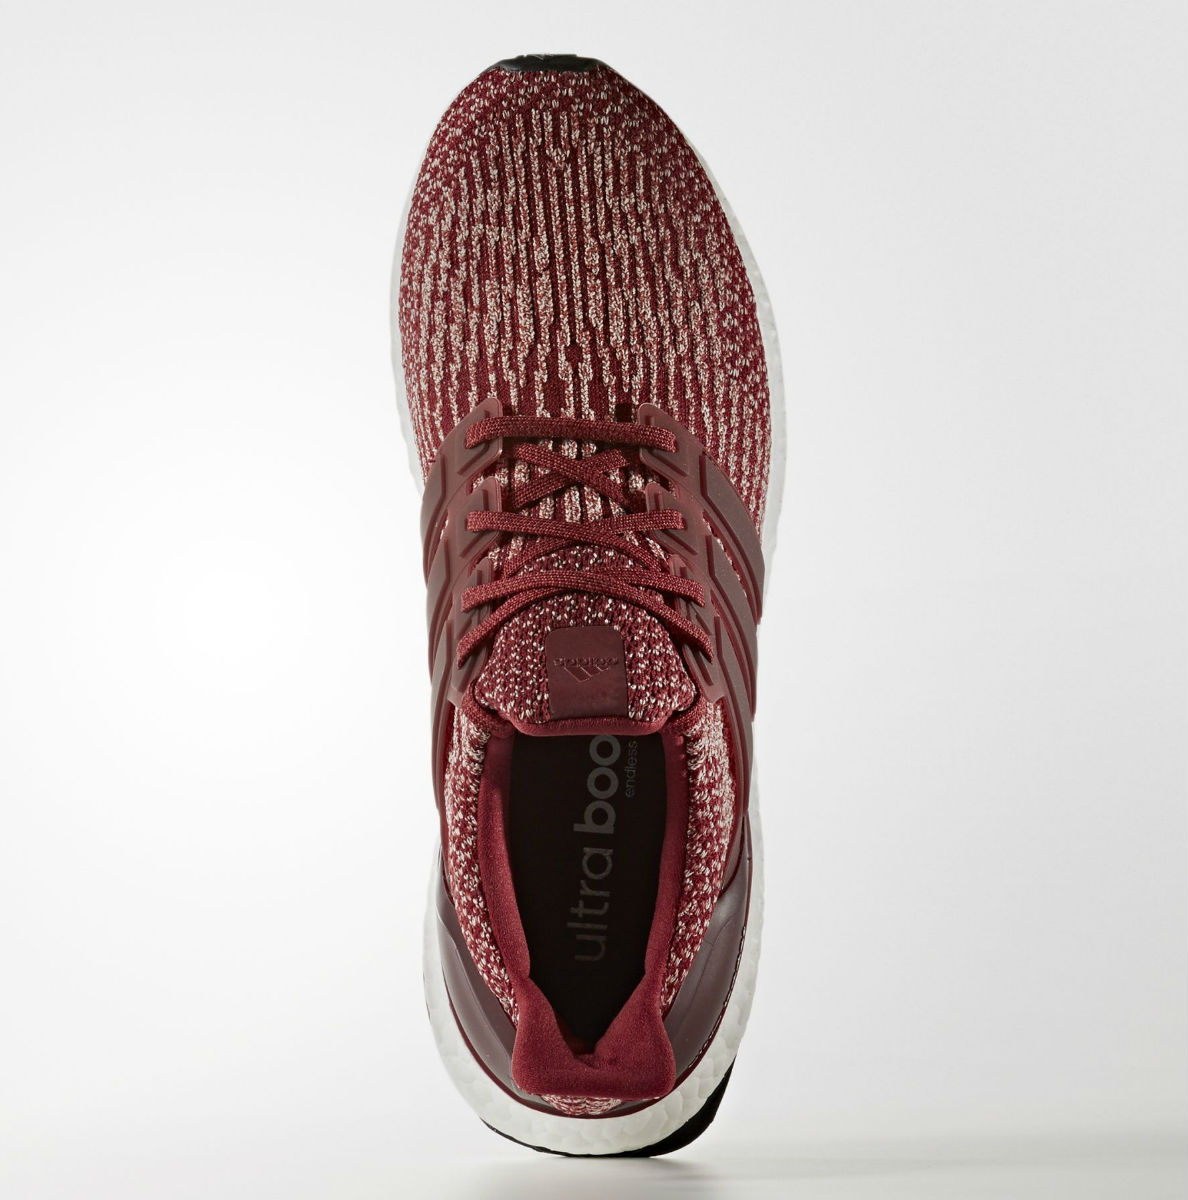 Adidas Ultra Boost 3.0 Burgundy Top BA8845